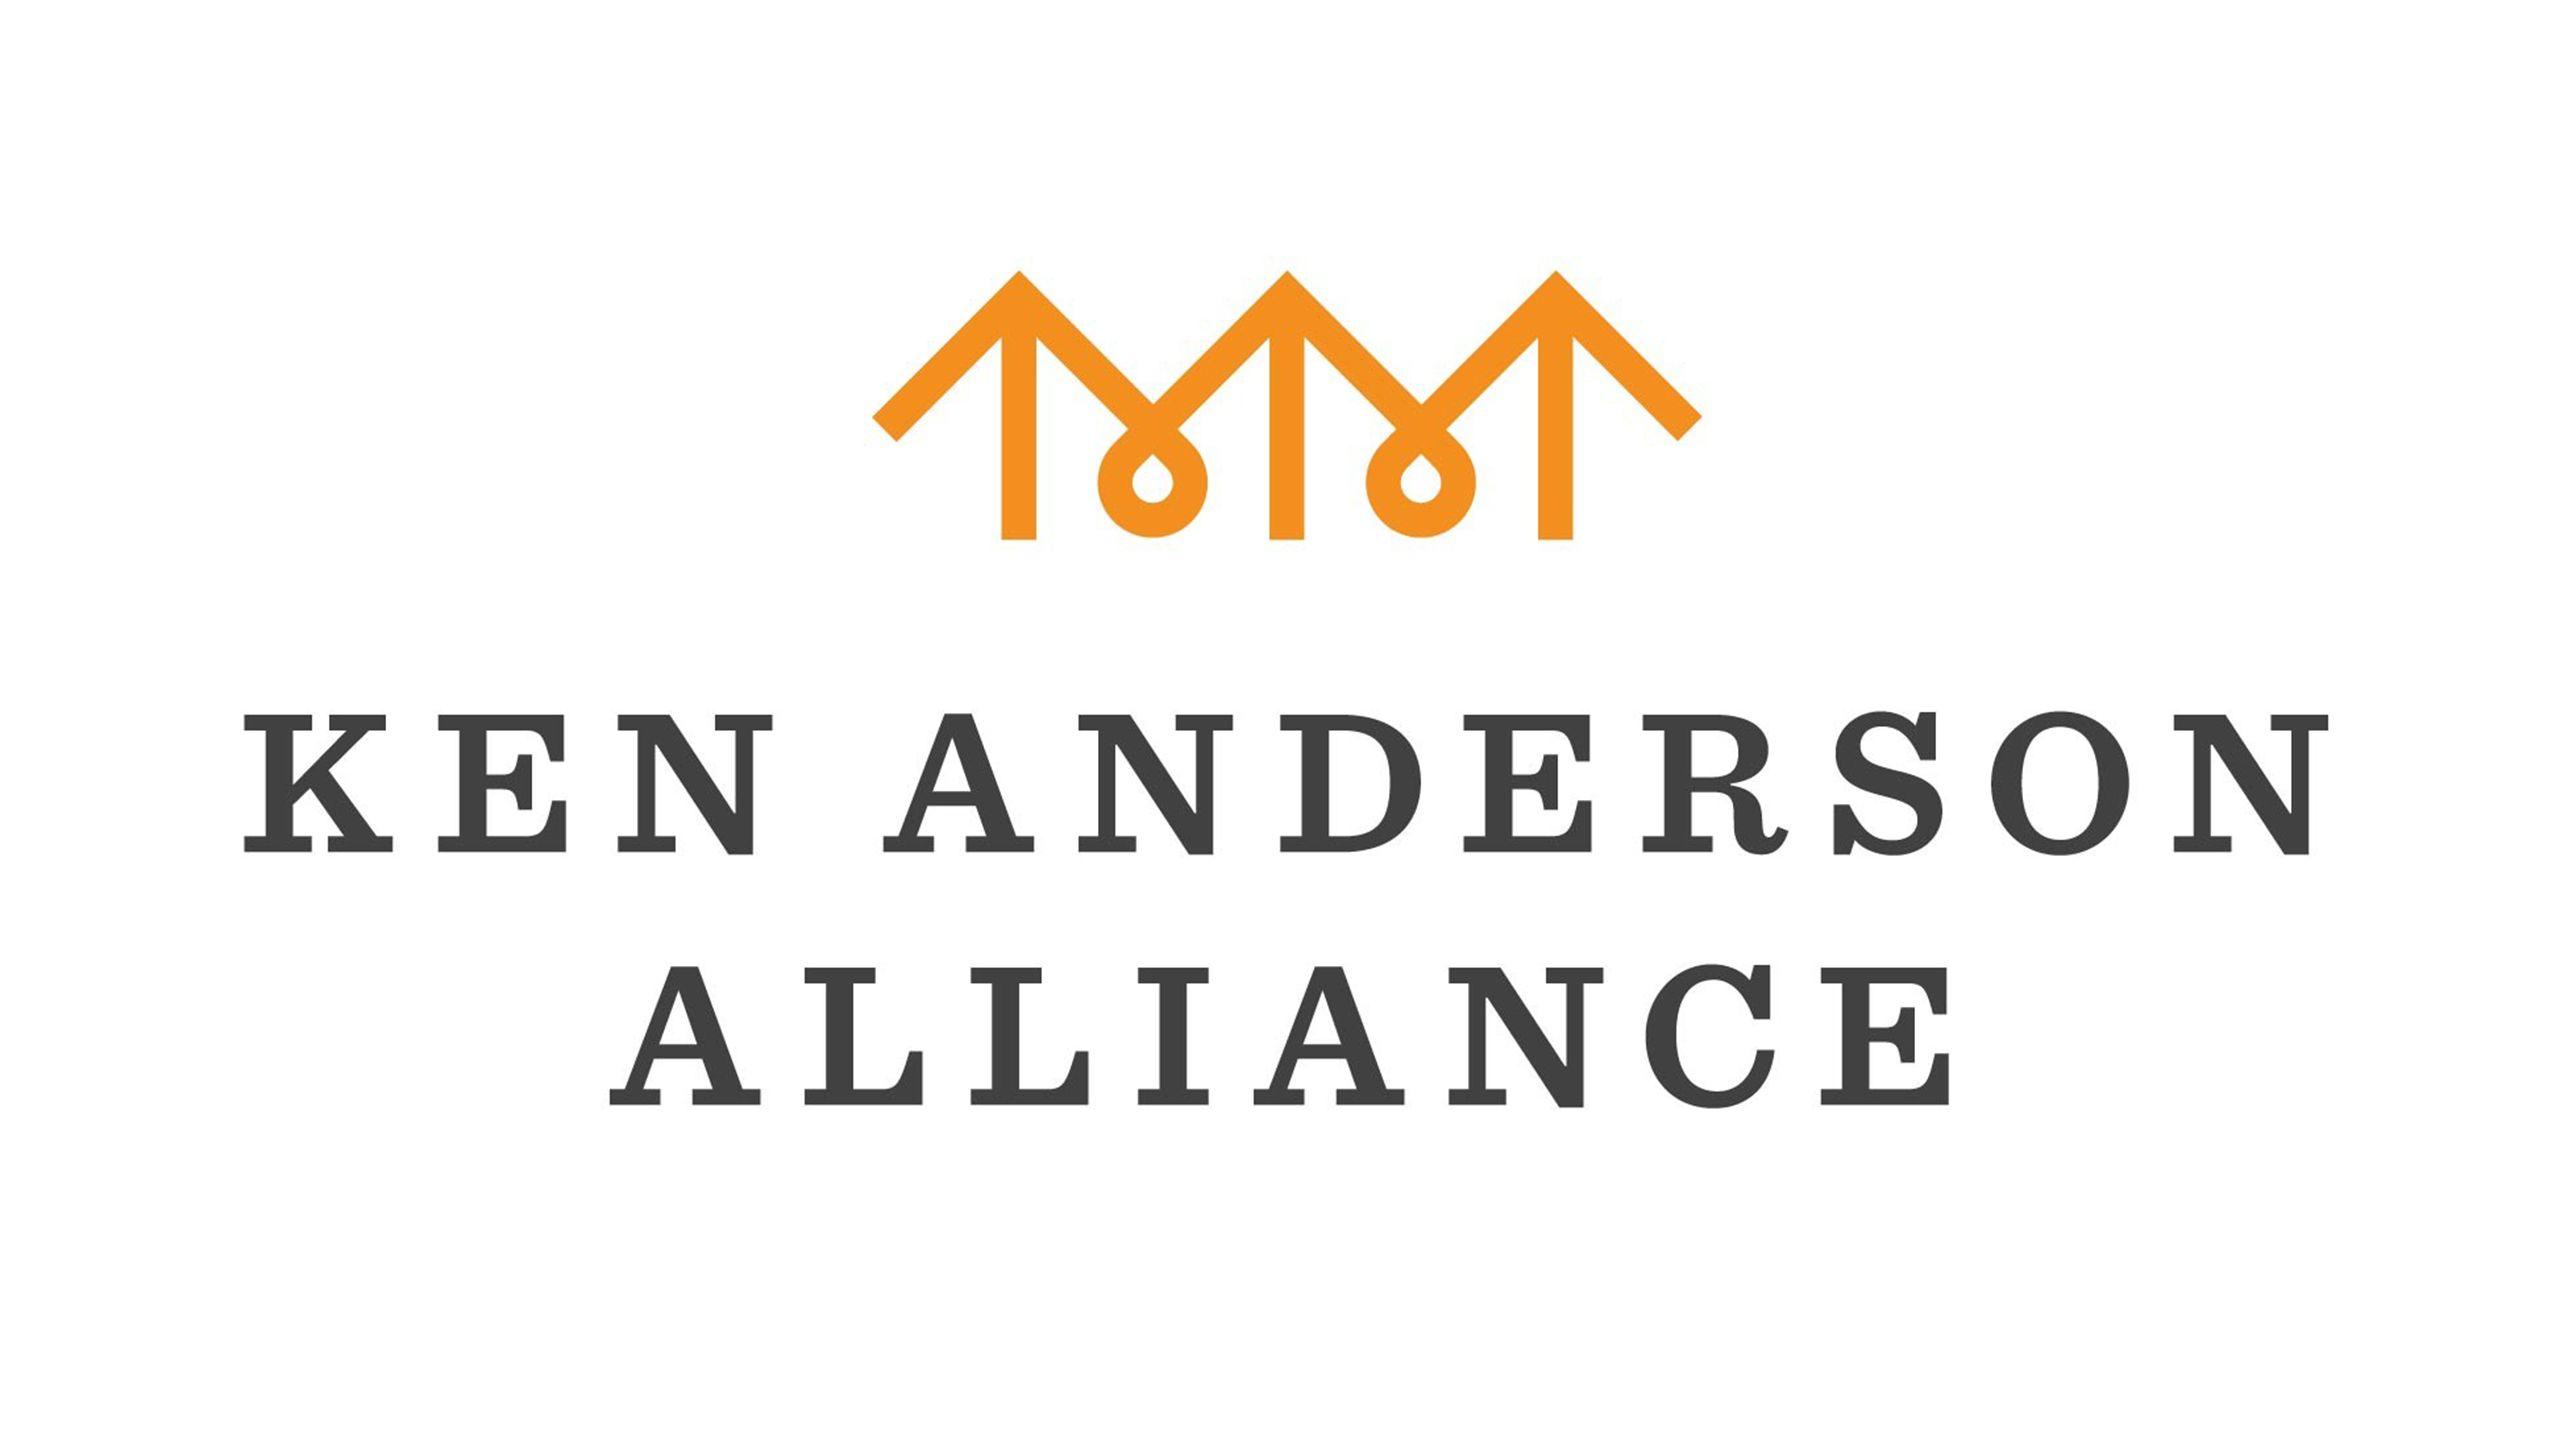 Ken Anderson Alliance